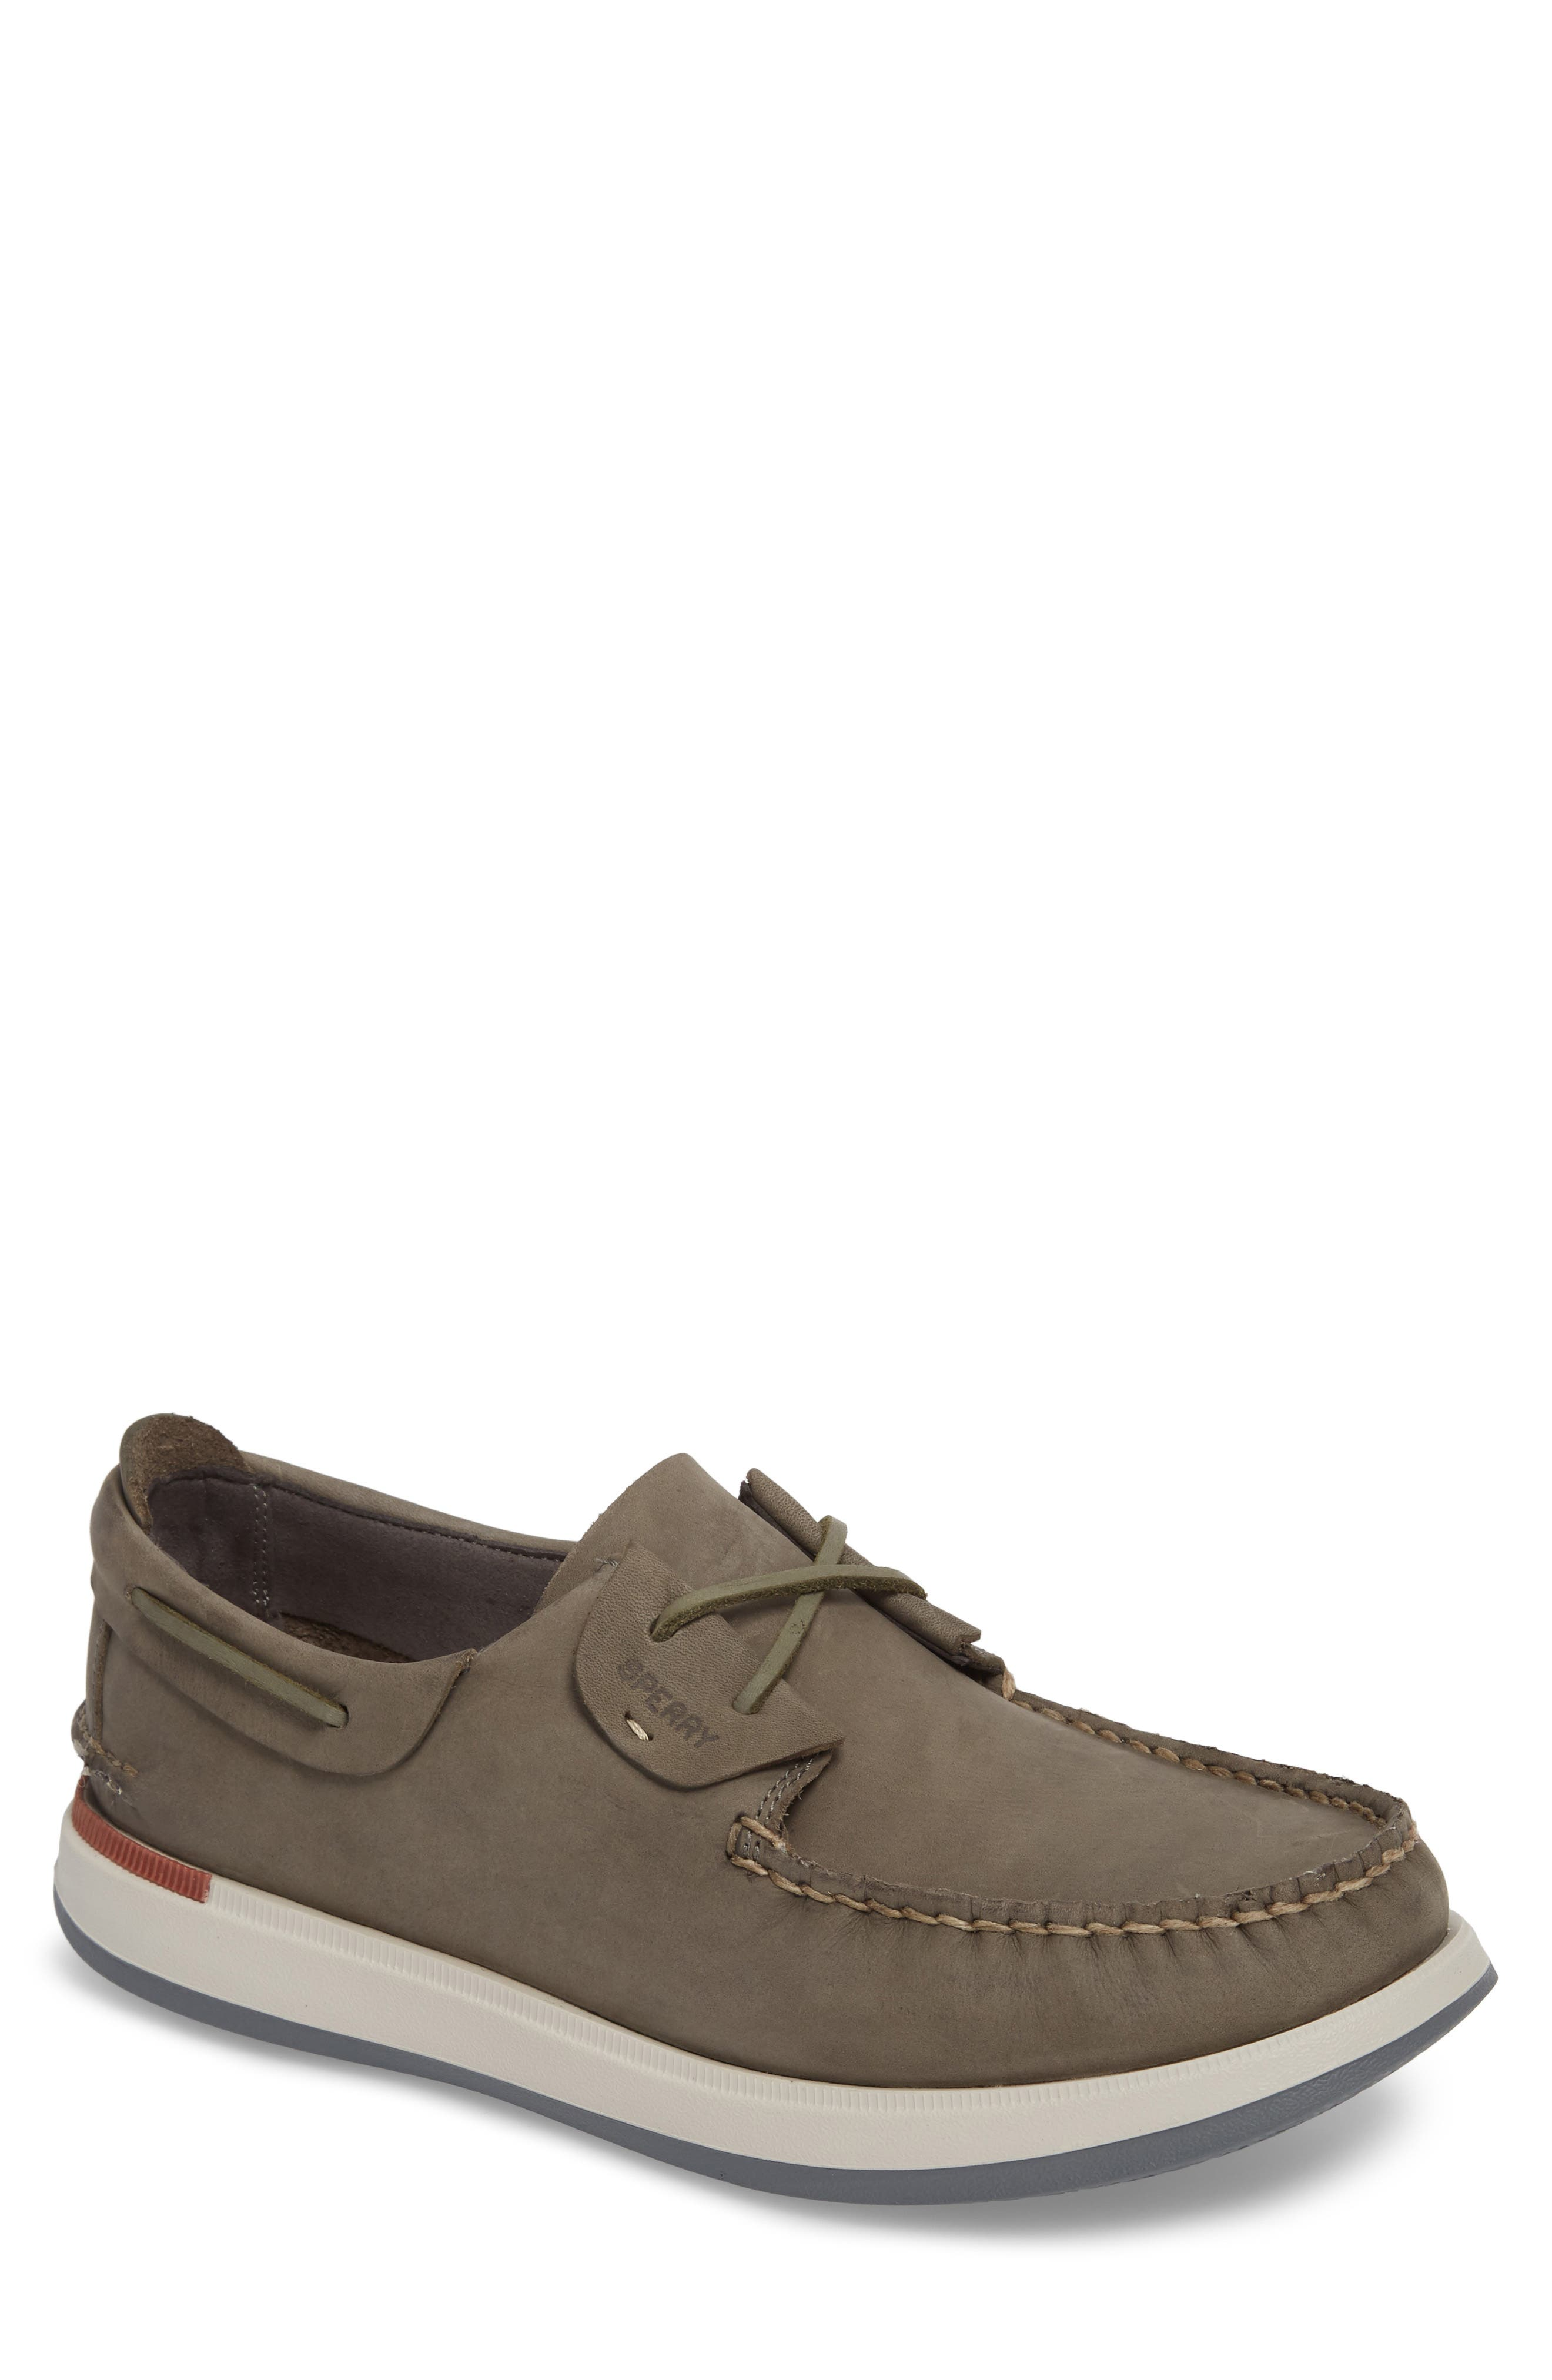 Caspian Boat Shoe,                         Main,                         color, Grey Leather